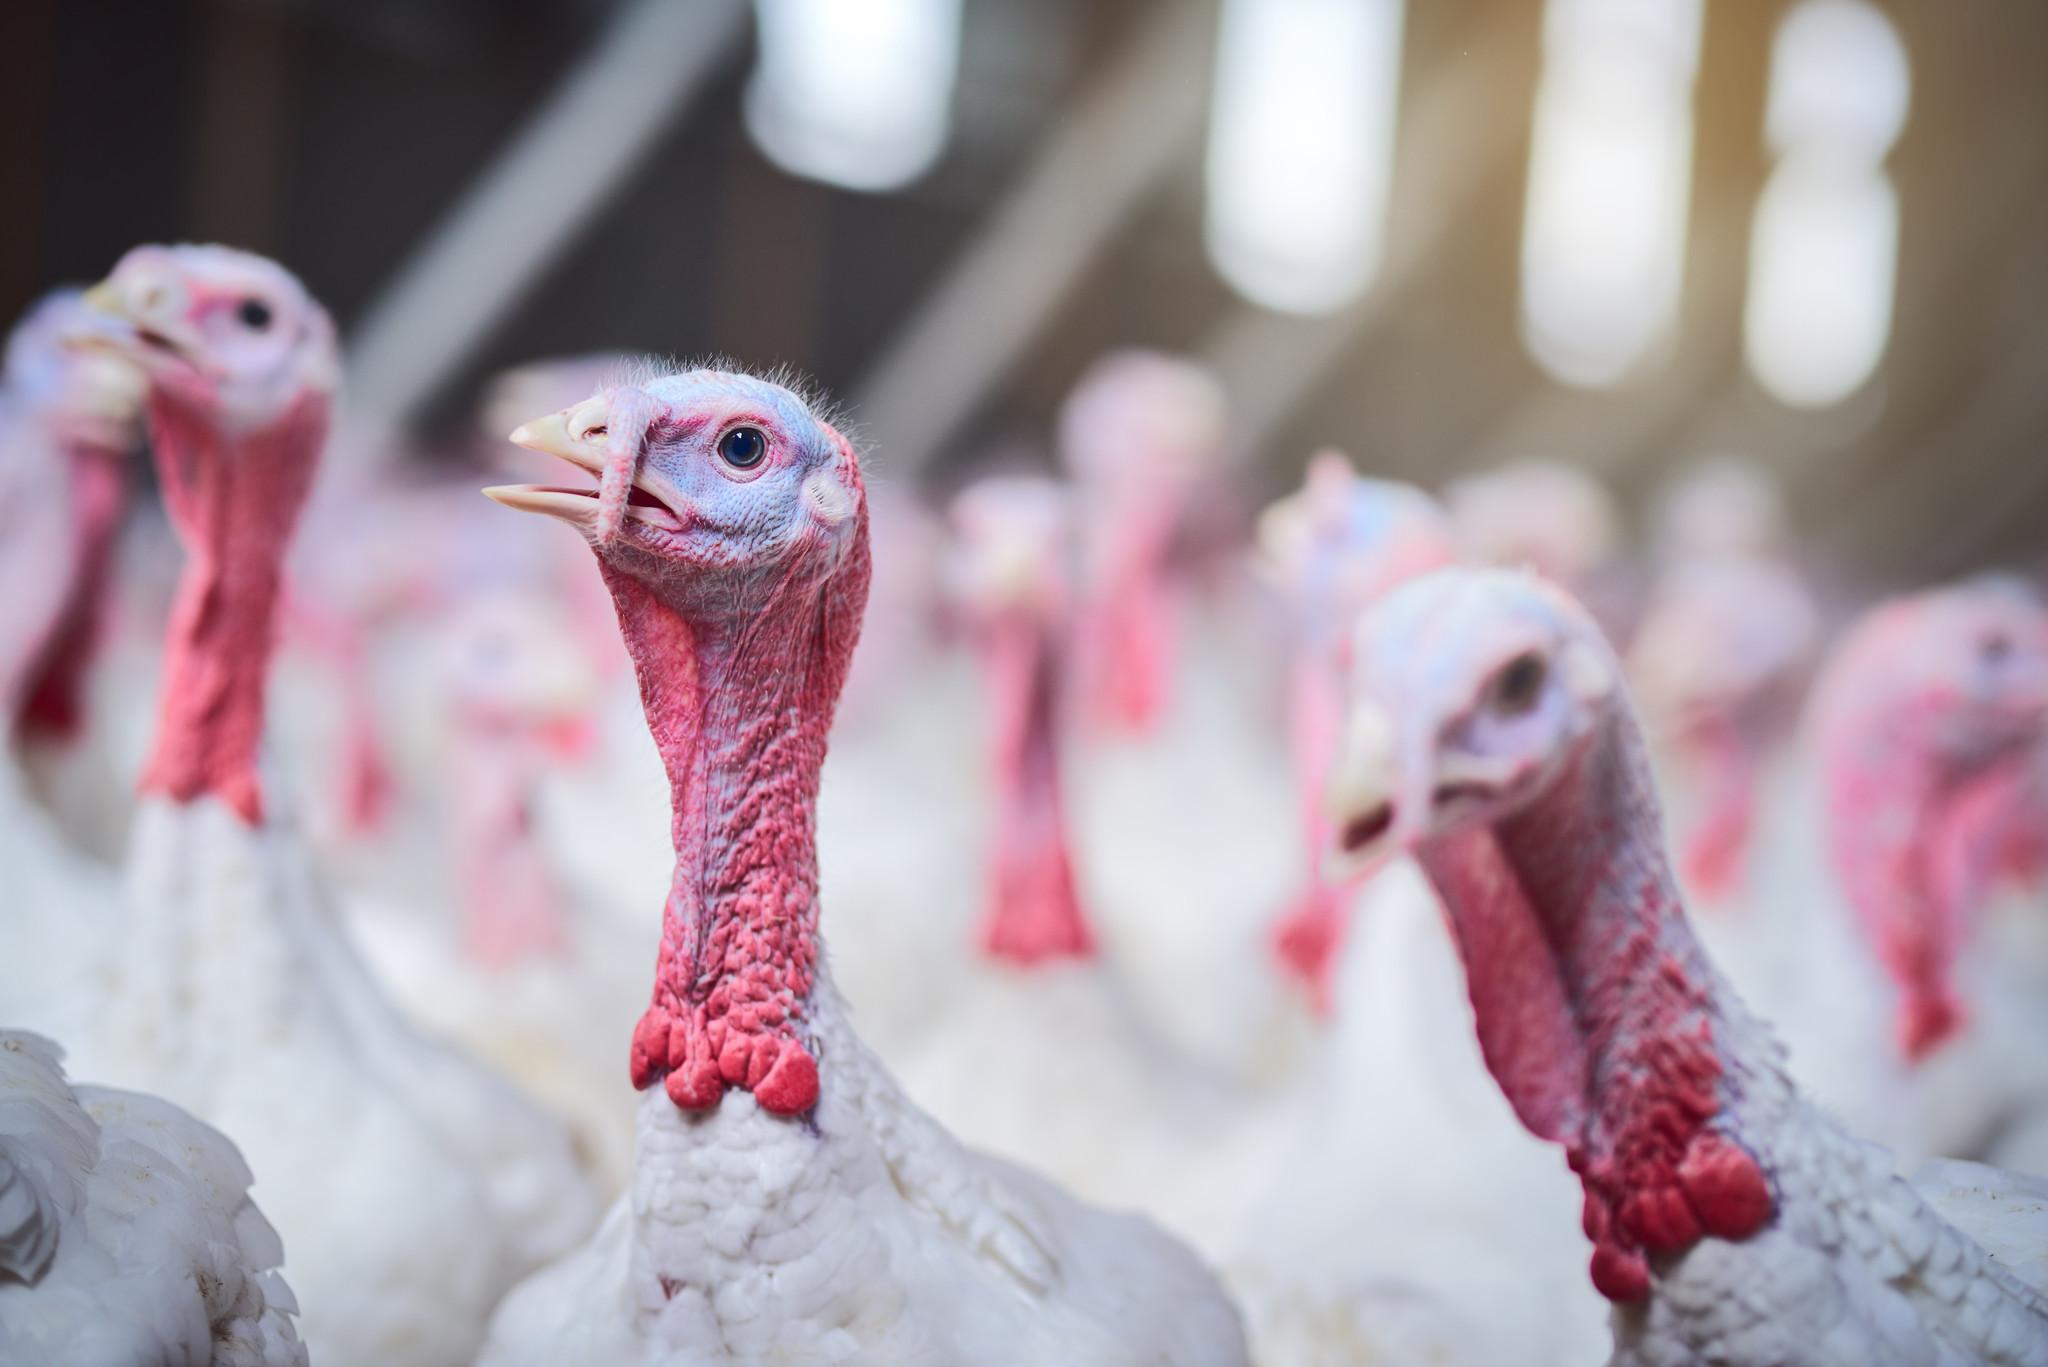 Bird flu kills 25,000 farmed turkeys in eastern Poland, thousands more culled